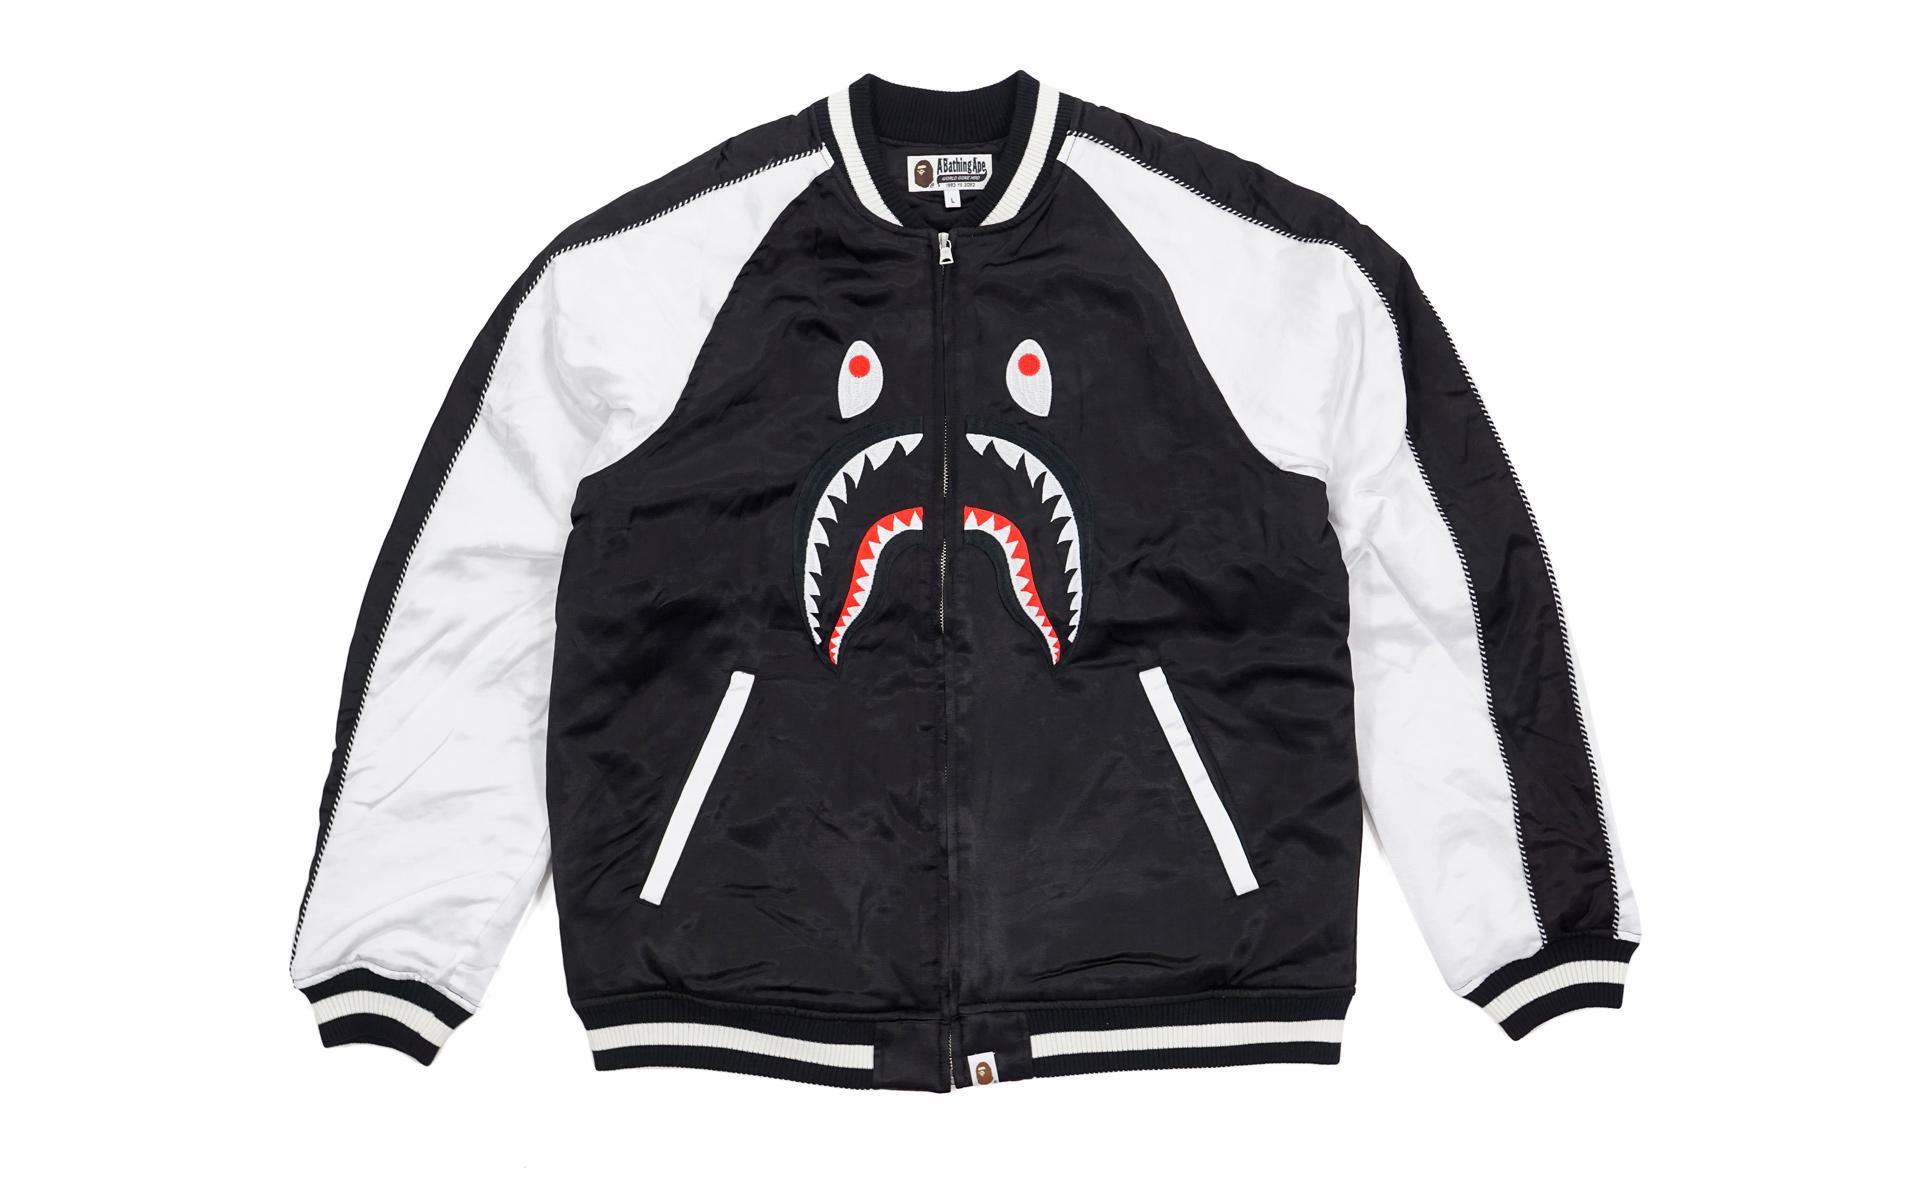 08fc585a8 Lyst - A Bathing Ape Shark Souvenir Suka Jacket Black in Black for Men